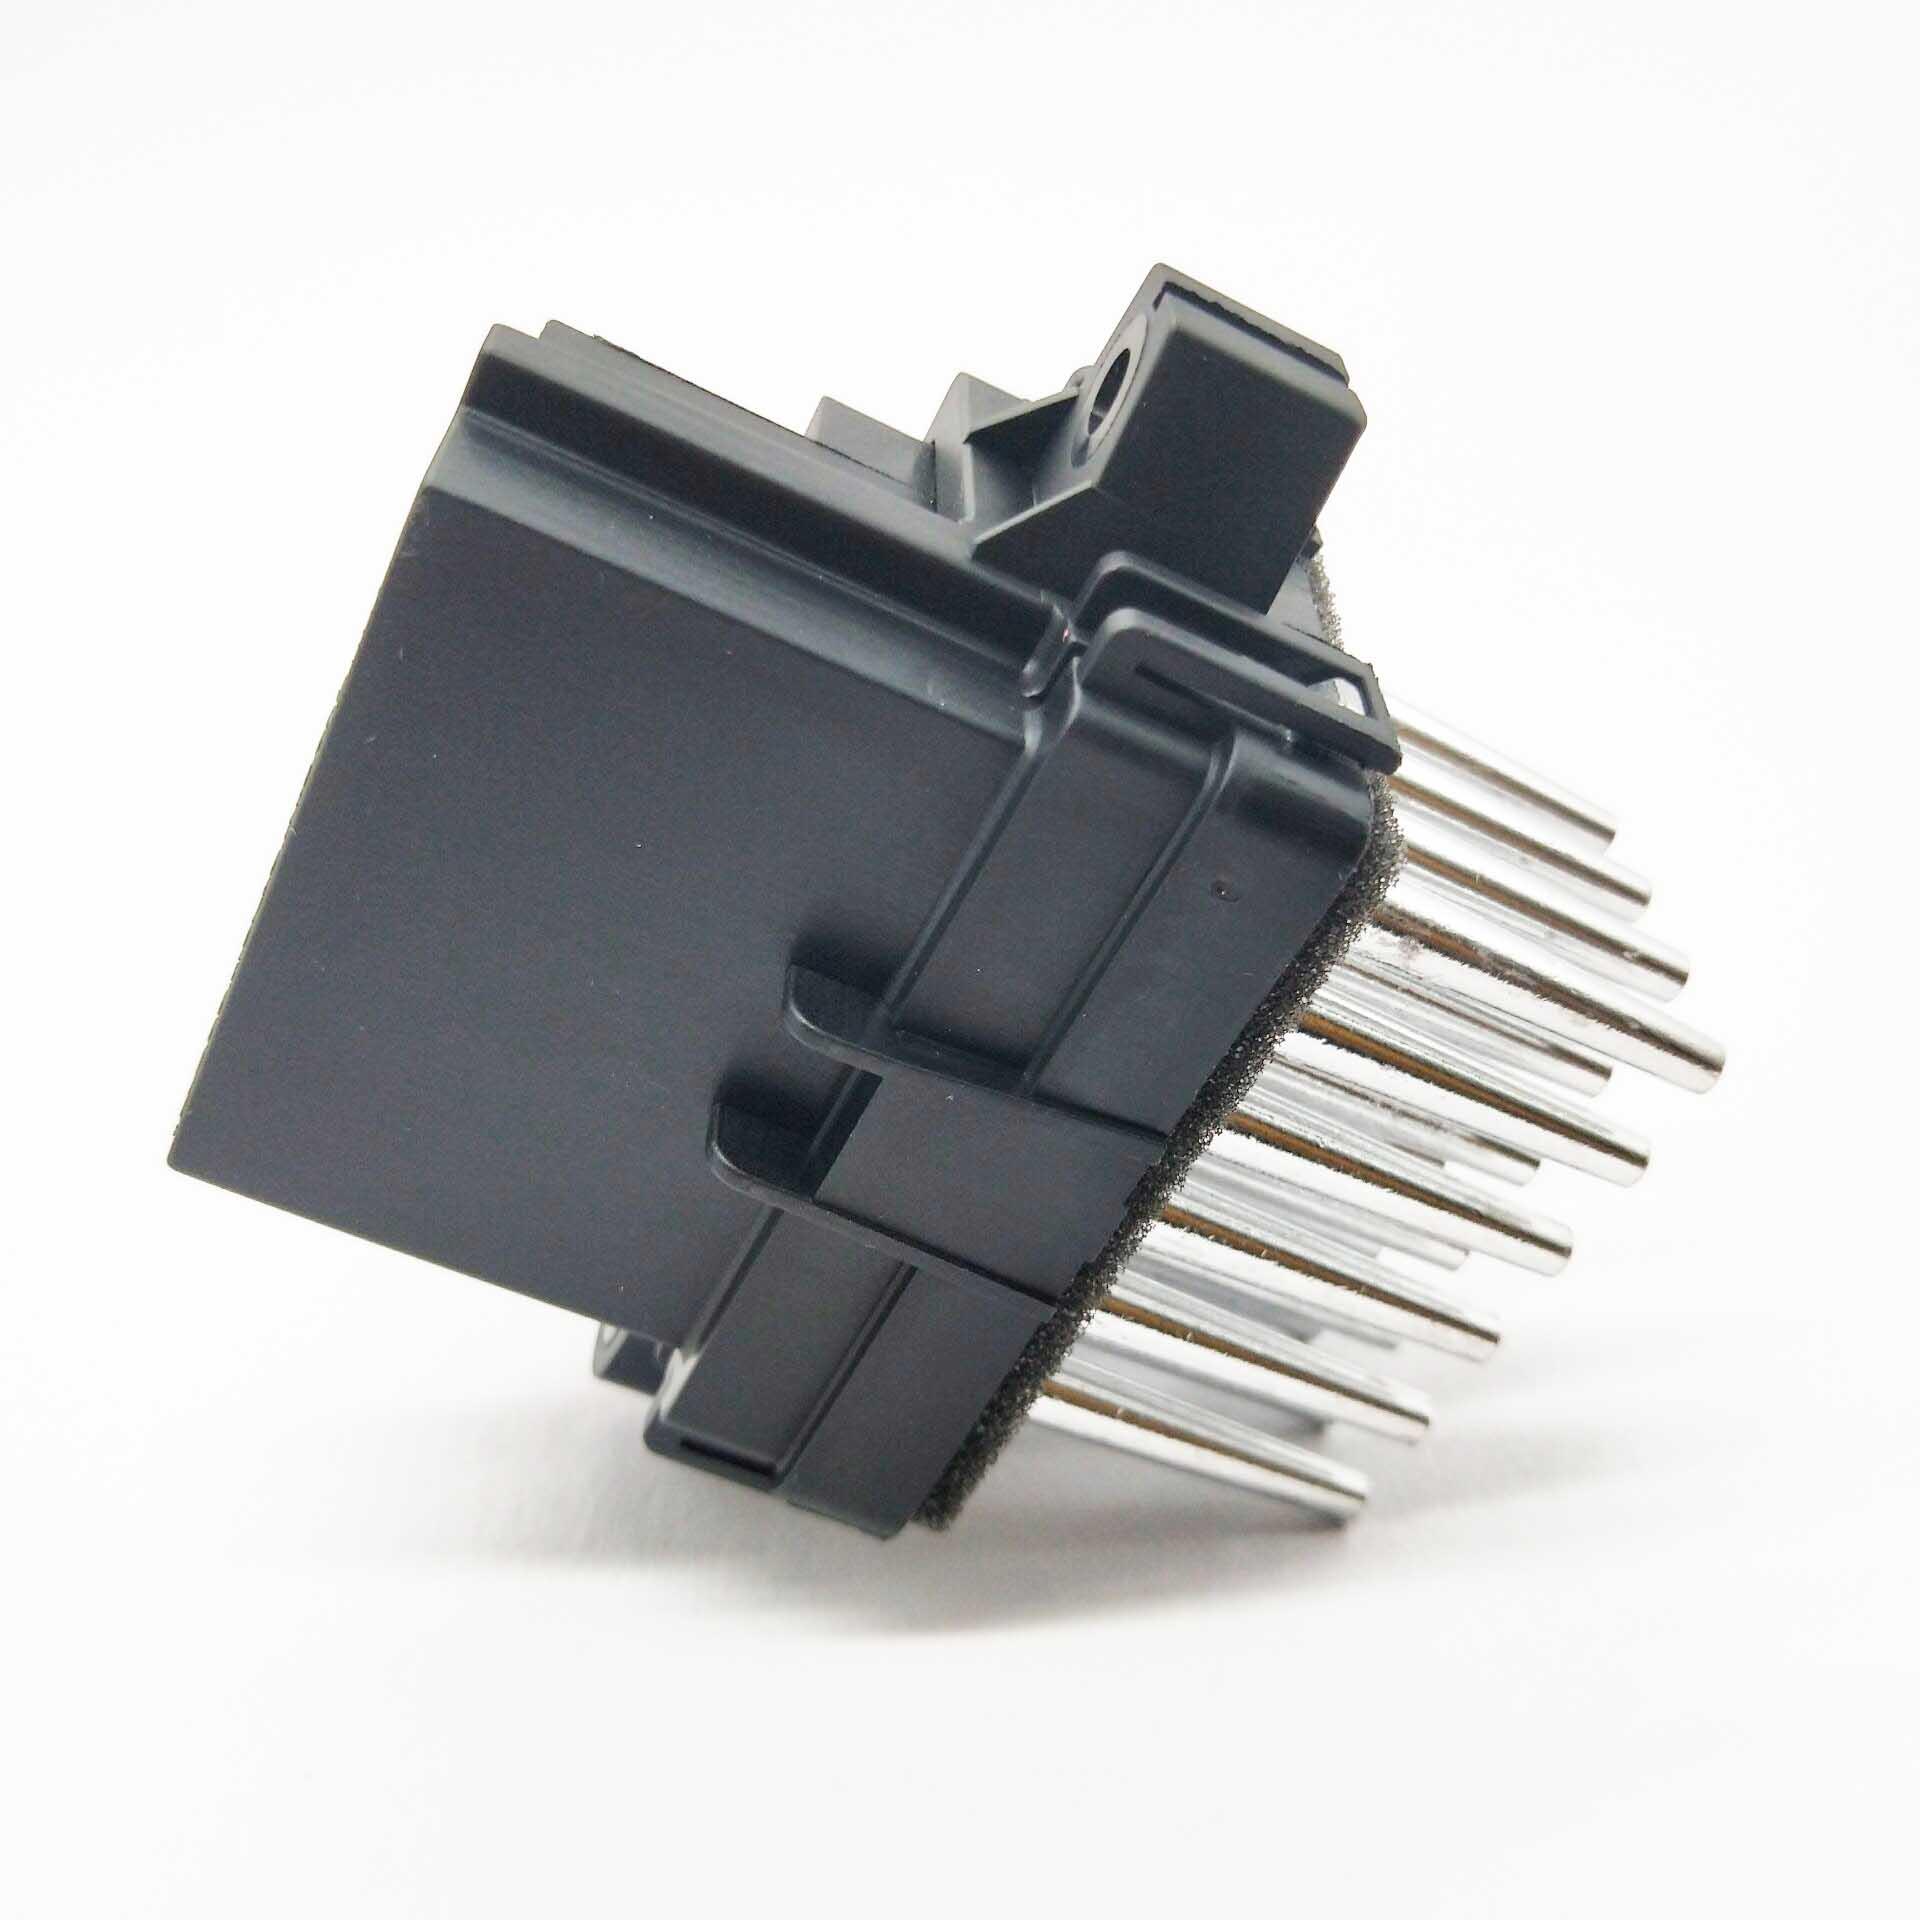 High-quality HVAC Blower Motor Resistor For Buick adillac Chevrolet GMC Hummer Pontiac Saab 13503201 13501703 13598090 15141283